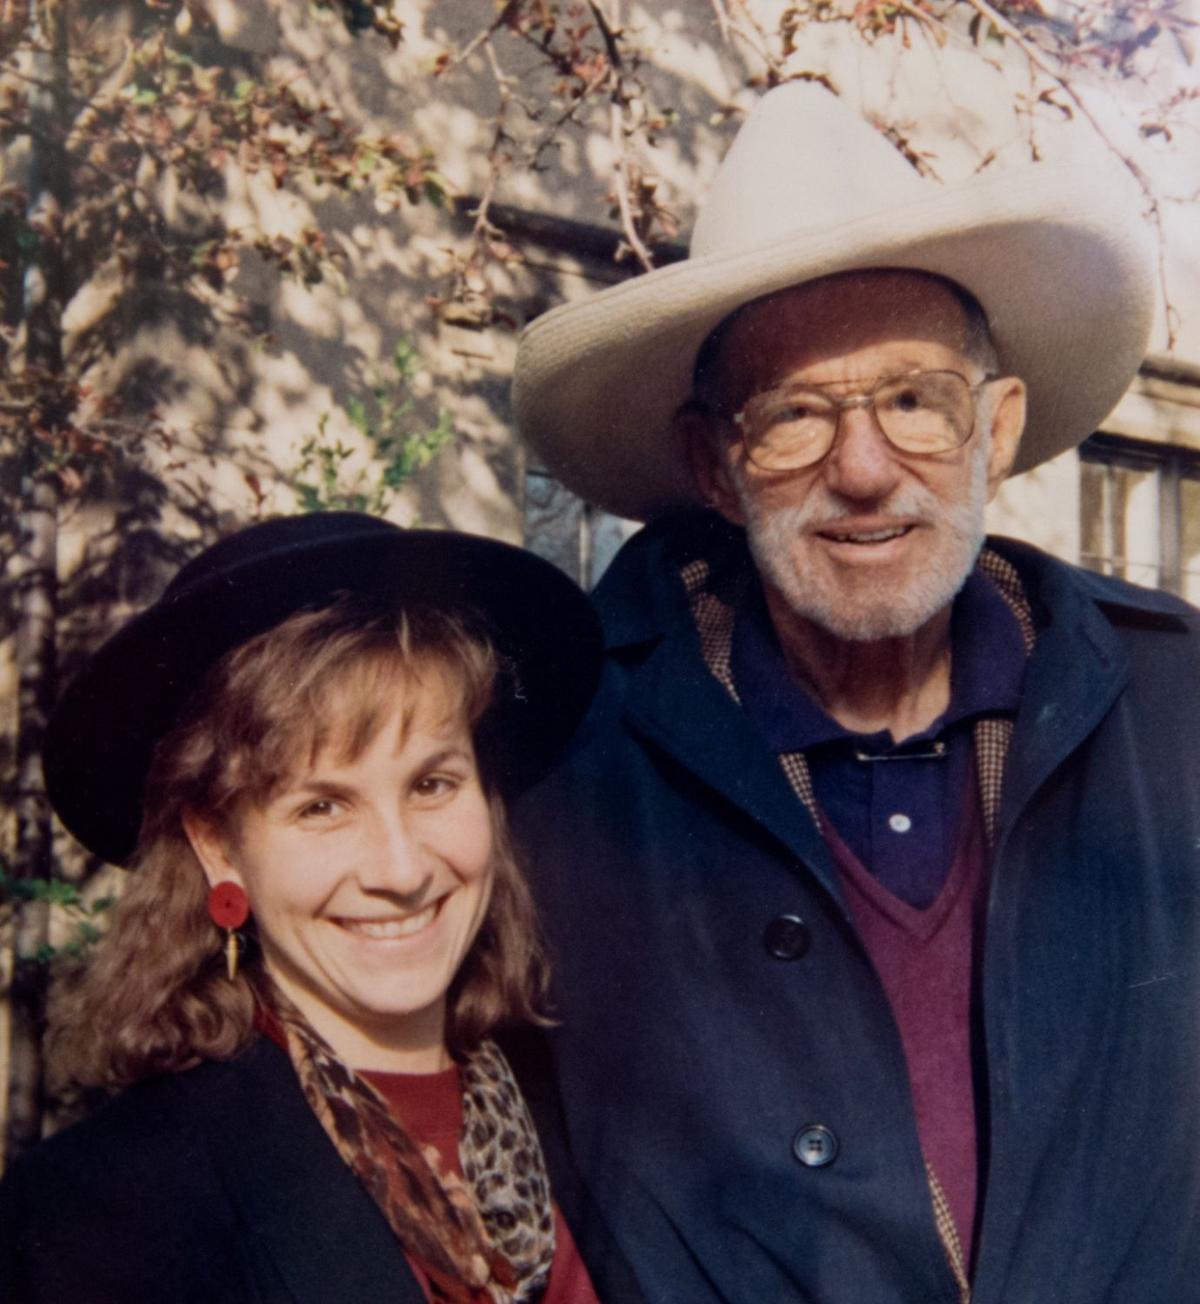 Dr. Laura Jana and Dr. Benjamin Spock